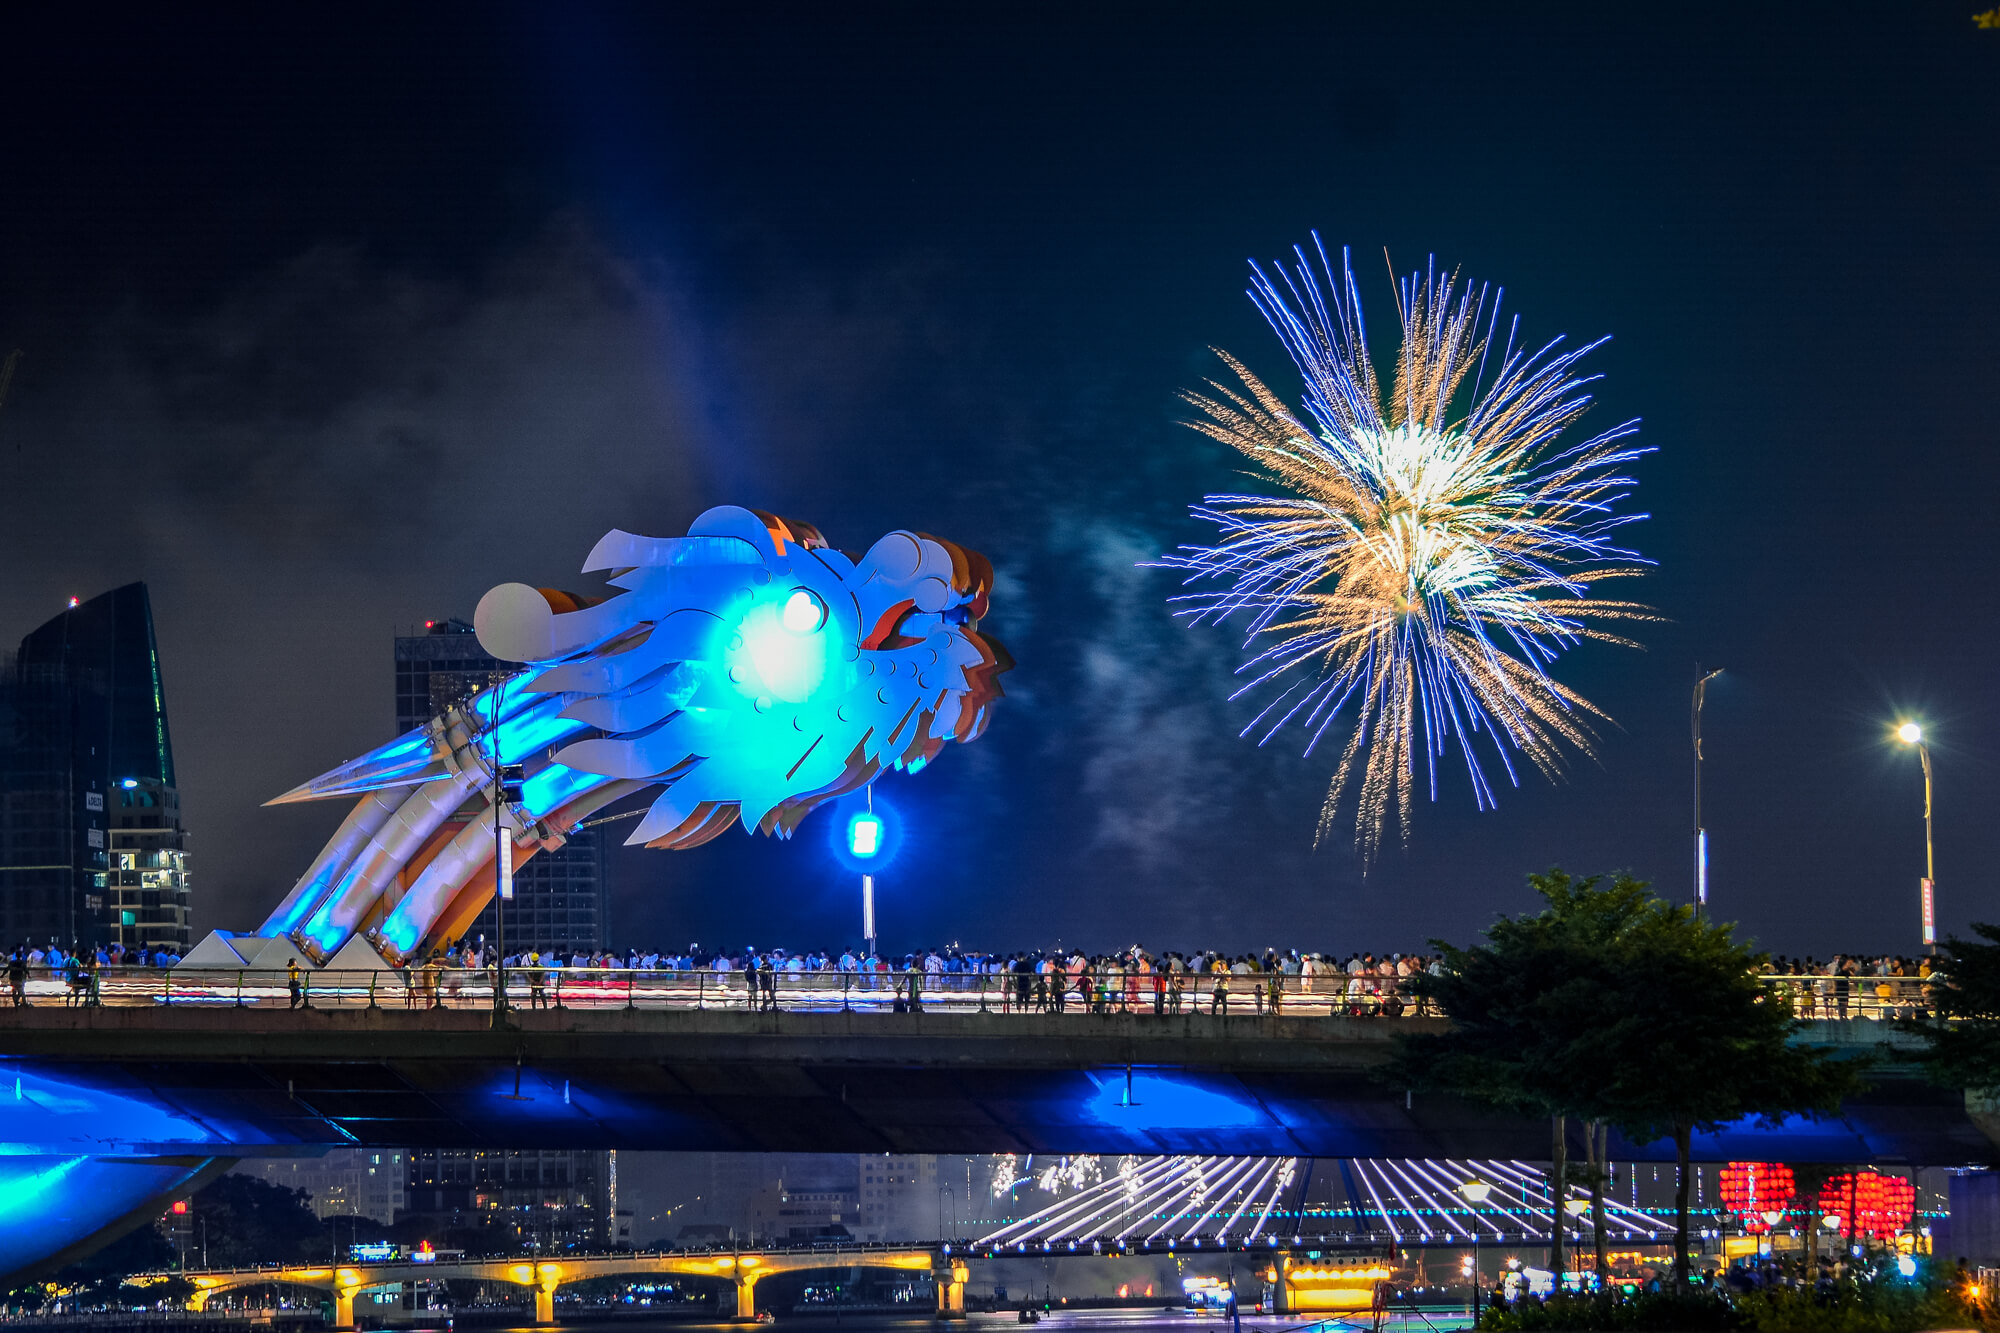 Fireworks at Dragon Bridge